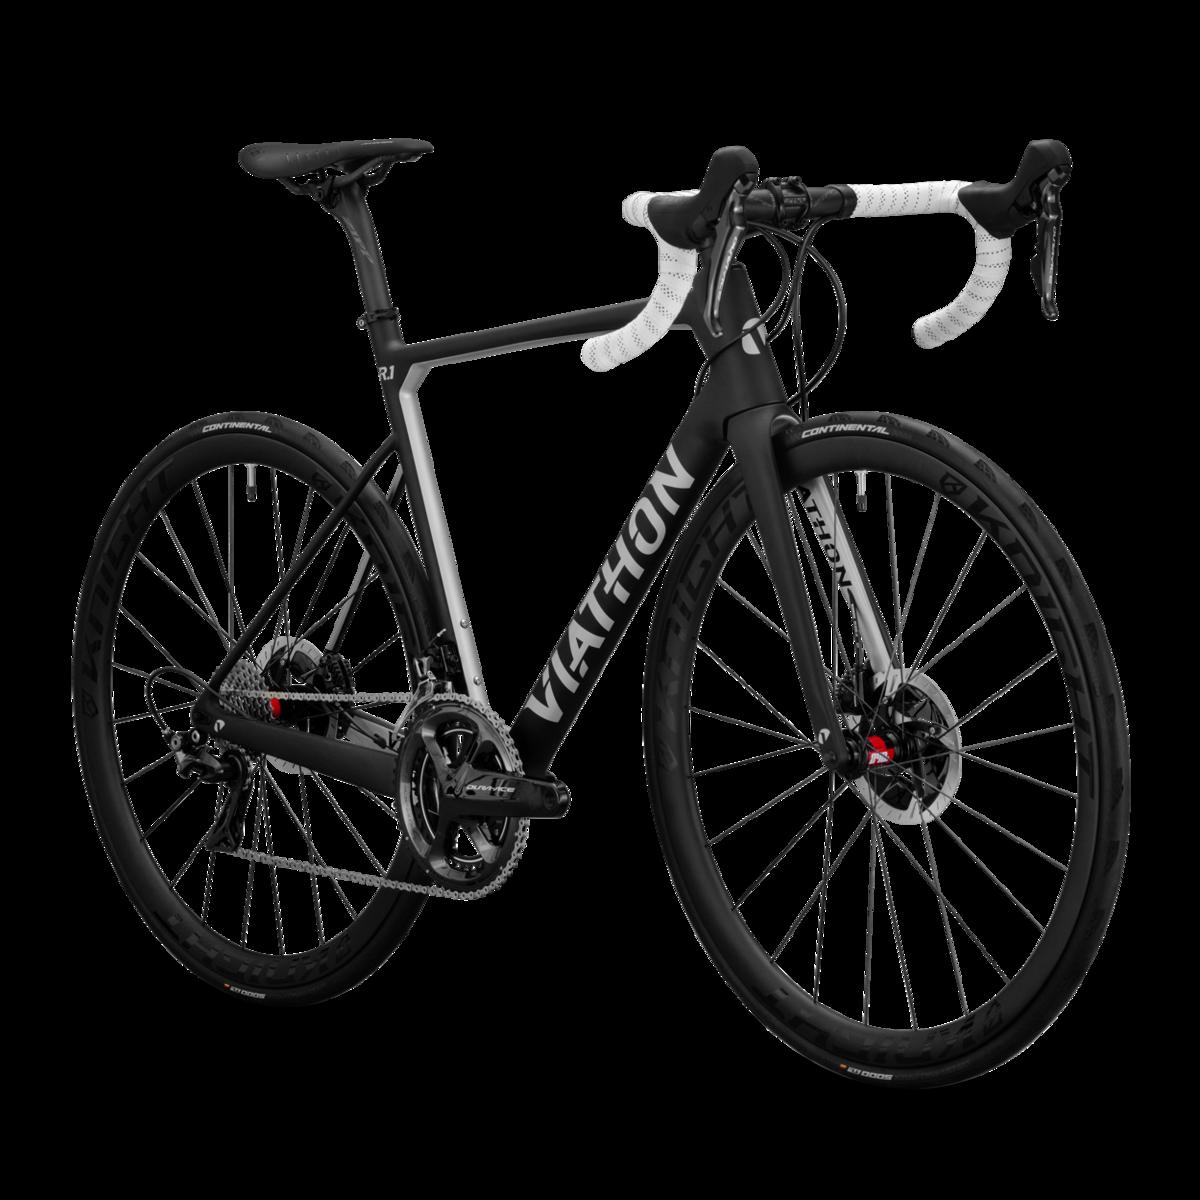 1200x1200 Viathon Bicycles Road Bike Shimano Dura Ace Equipped